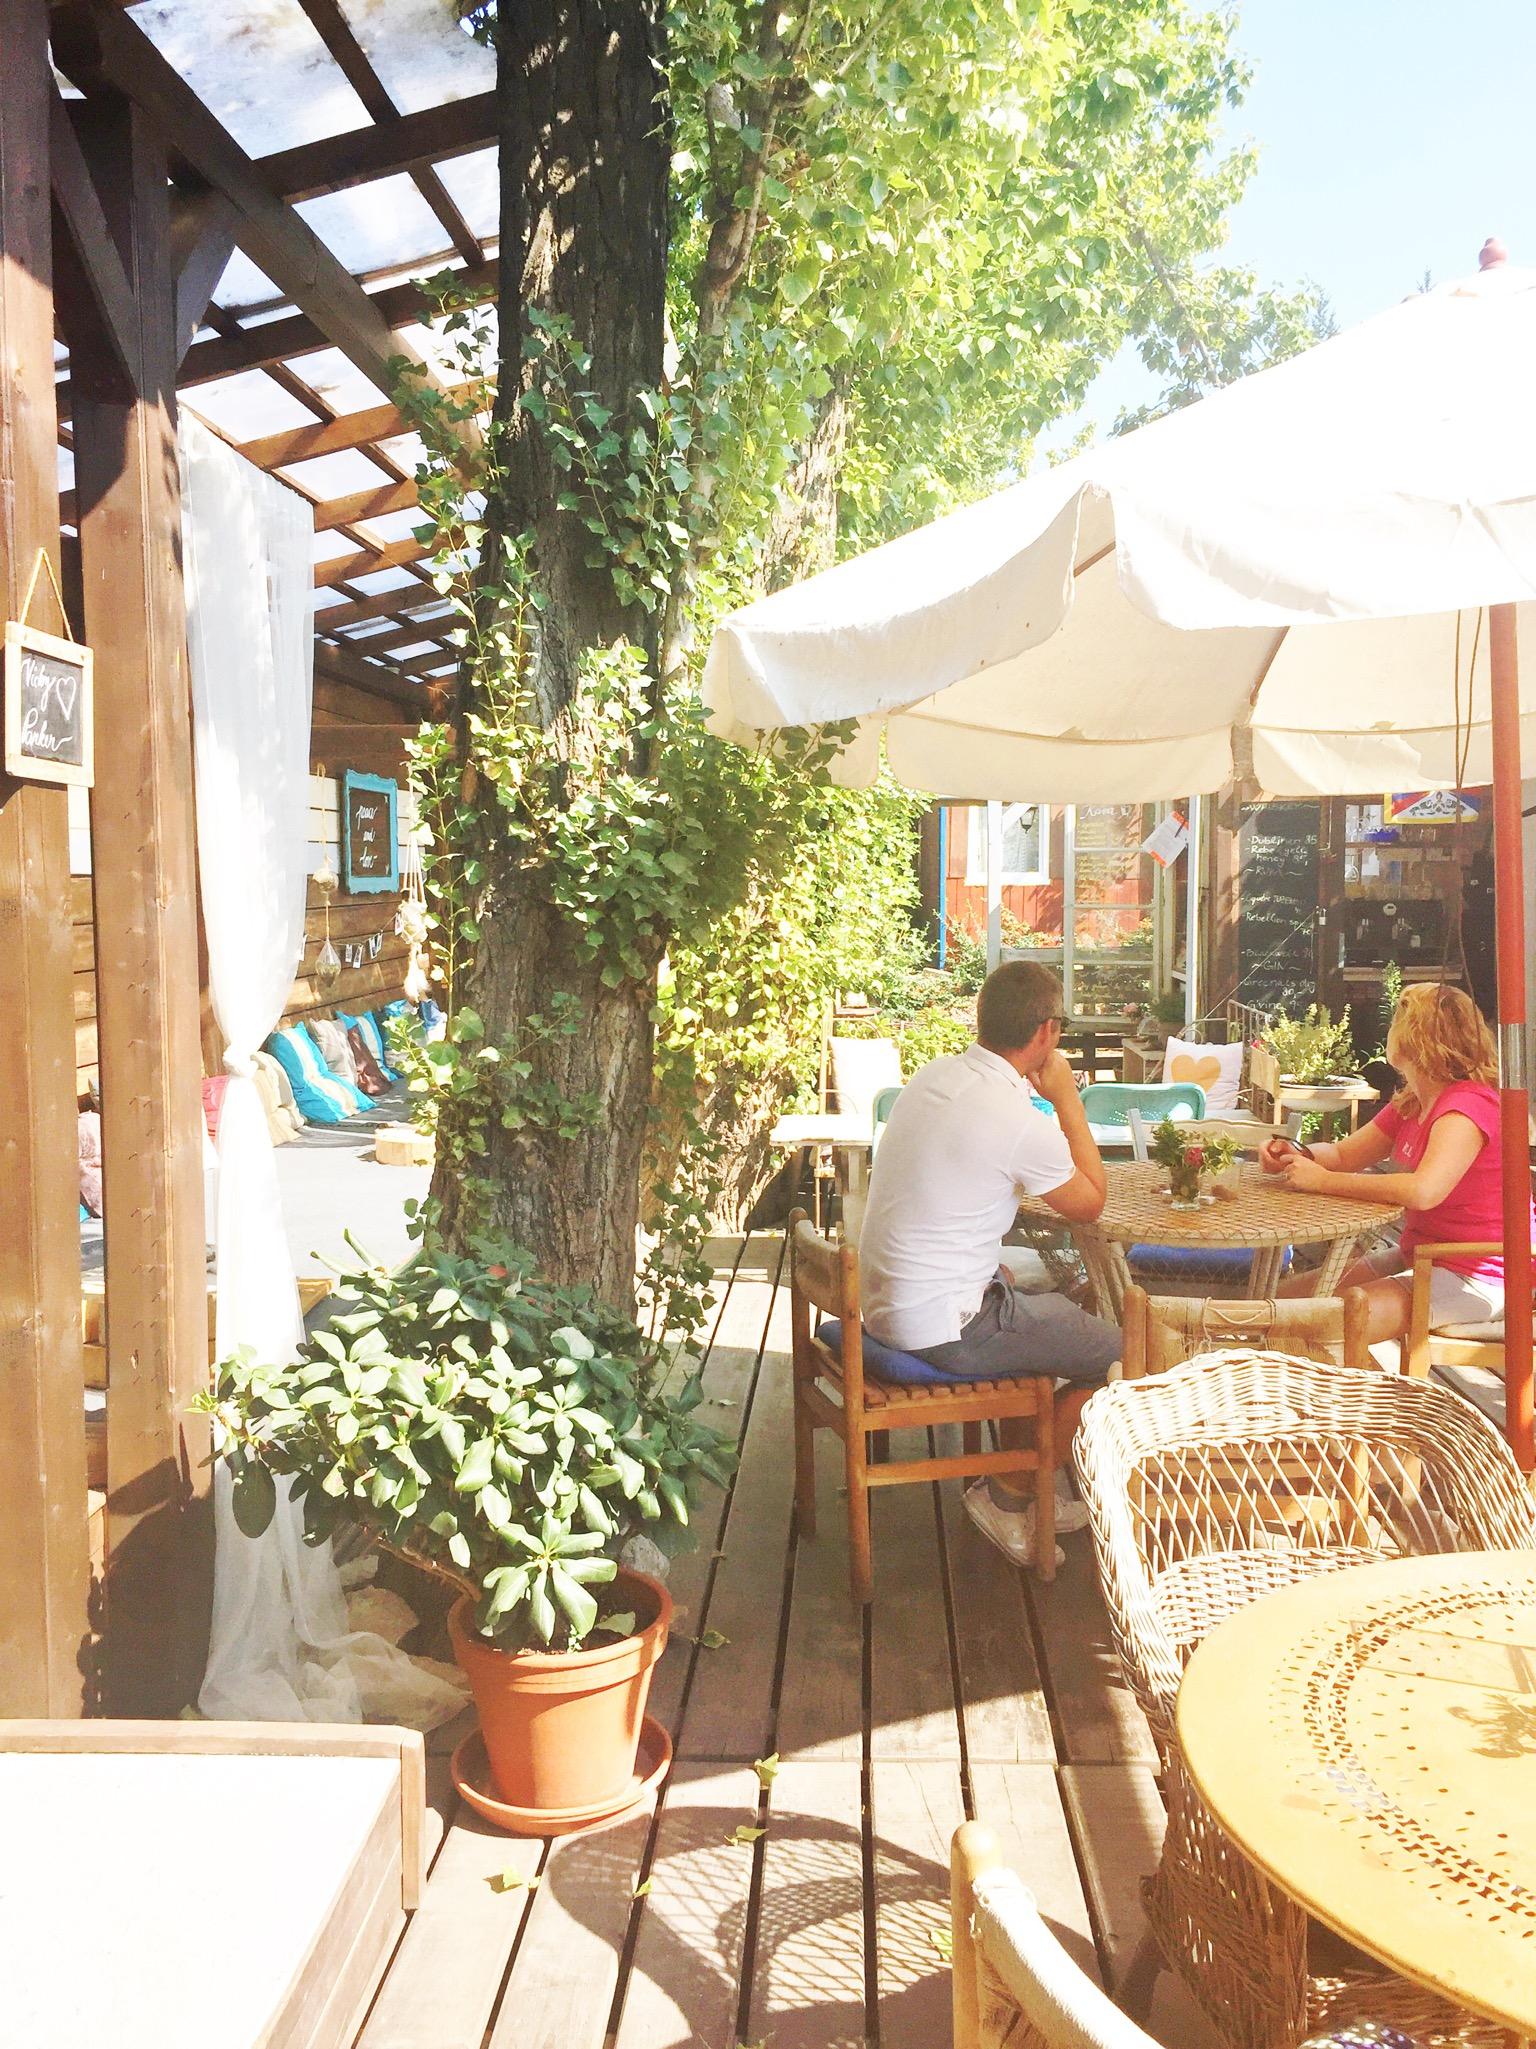 Urban Kristy Discoveries - September - Coffee Corner Prague